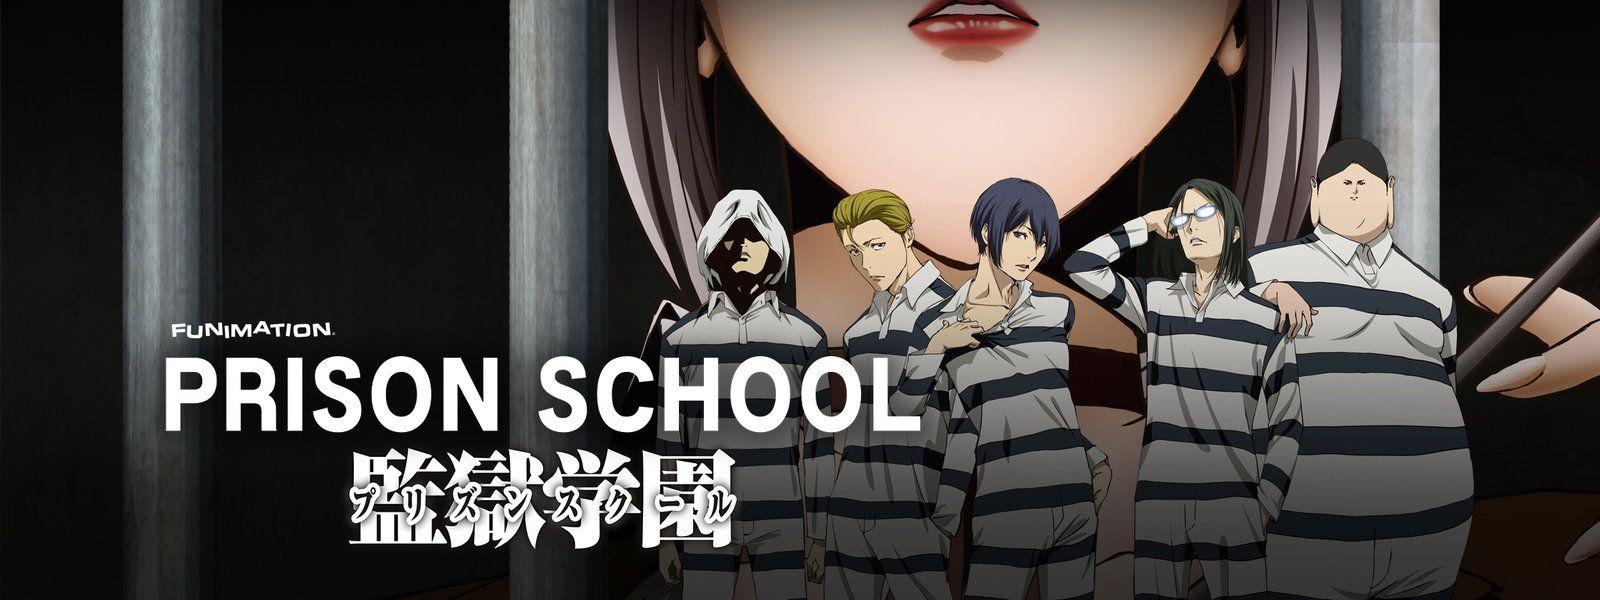 24042 1600 600 Prison School Funimation